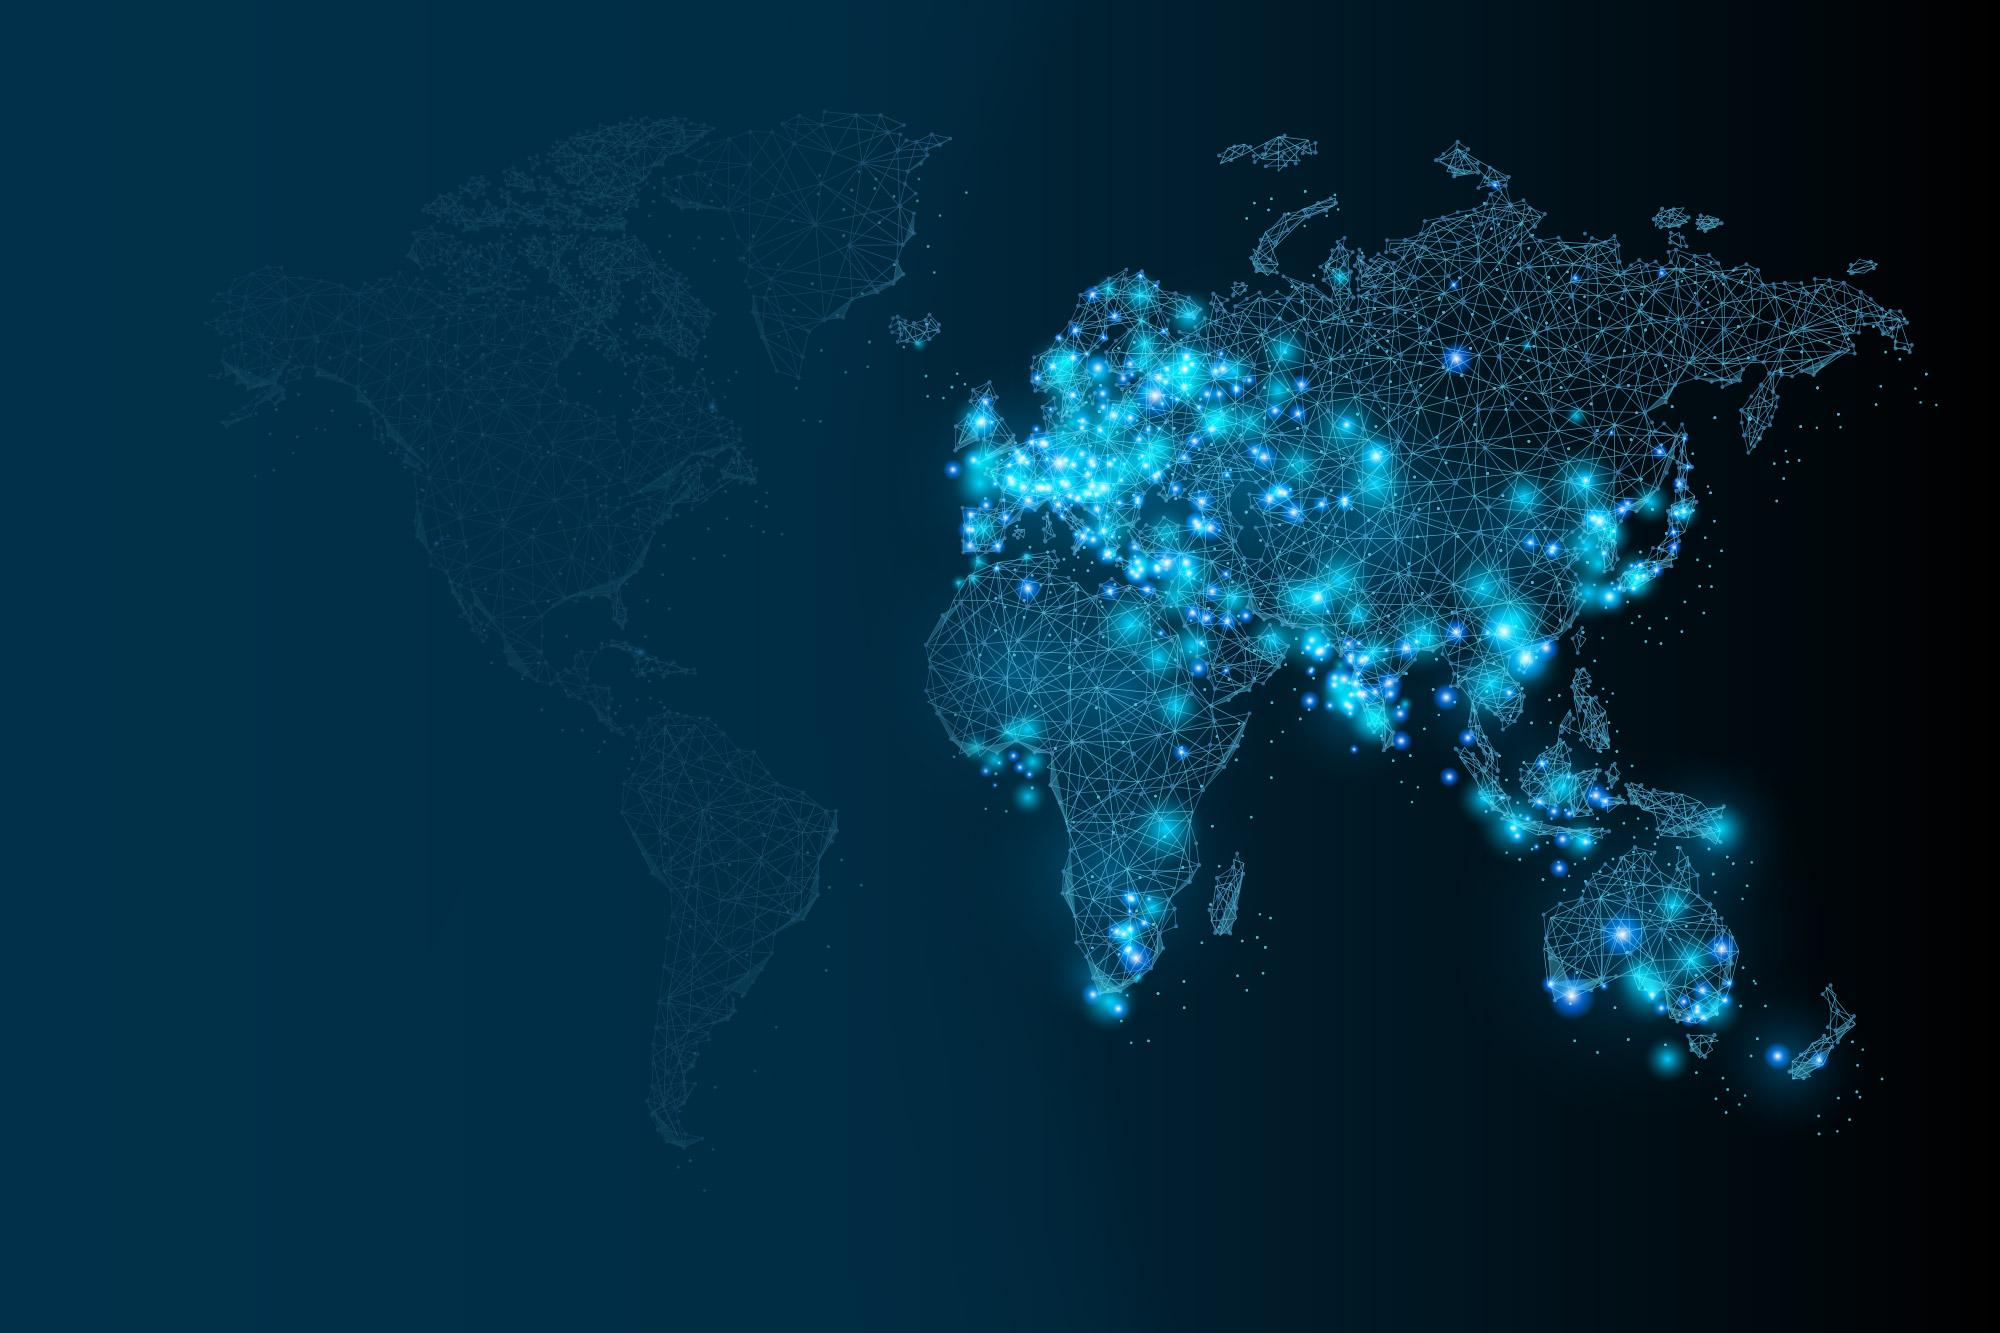 world-map-illustration.jpg